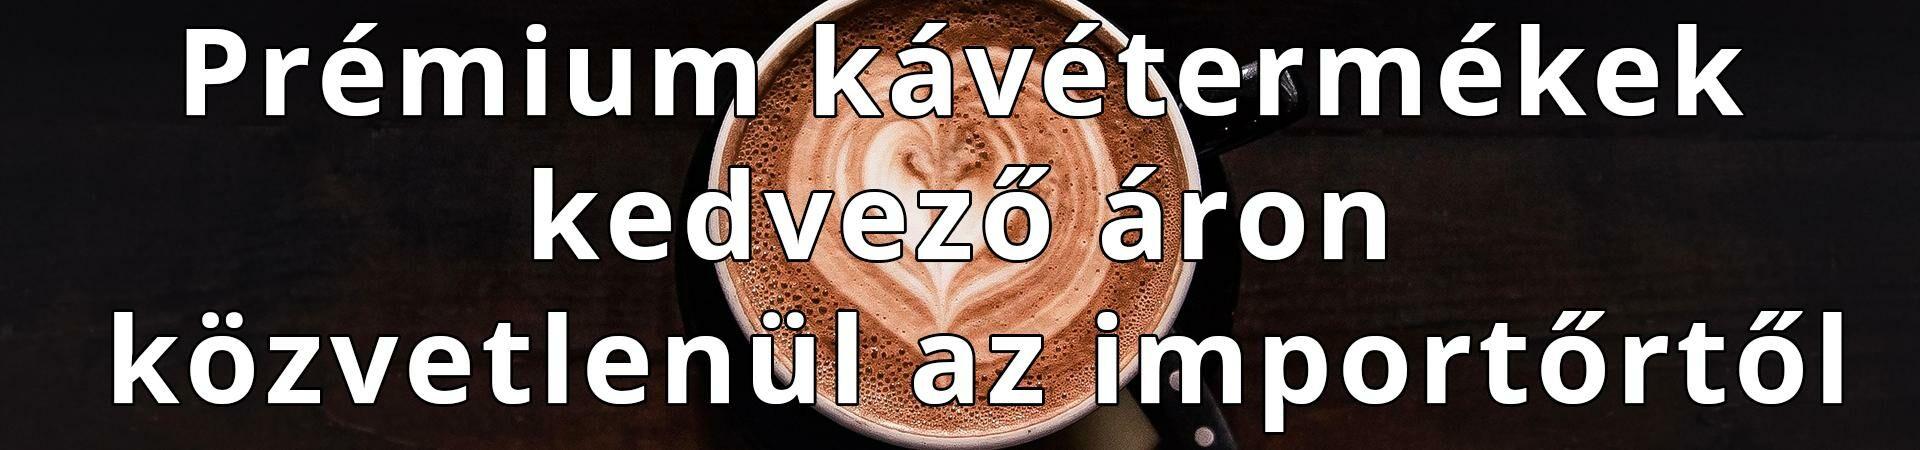 Prémium kávé